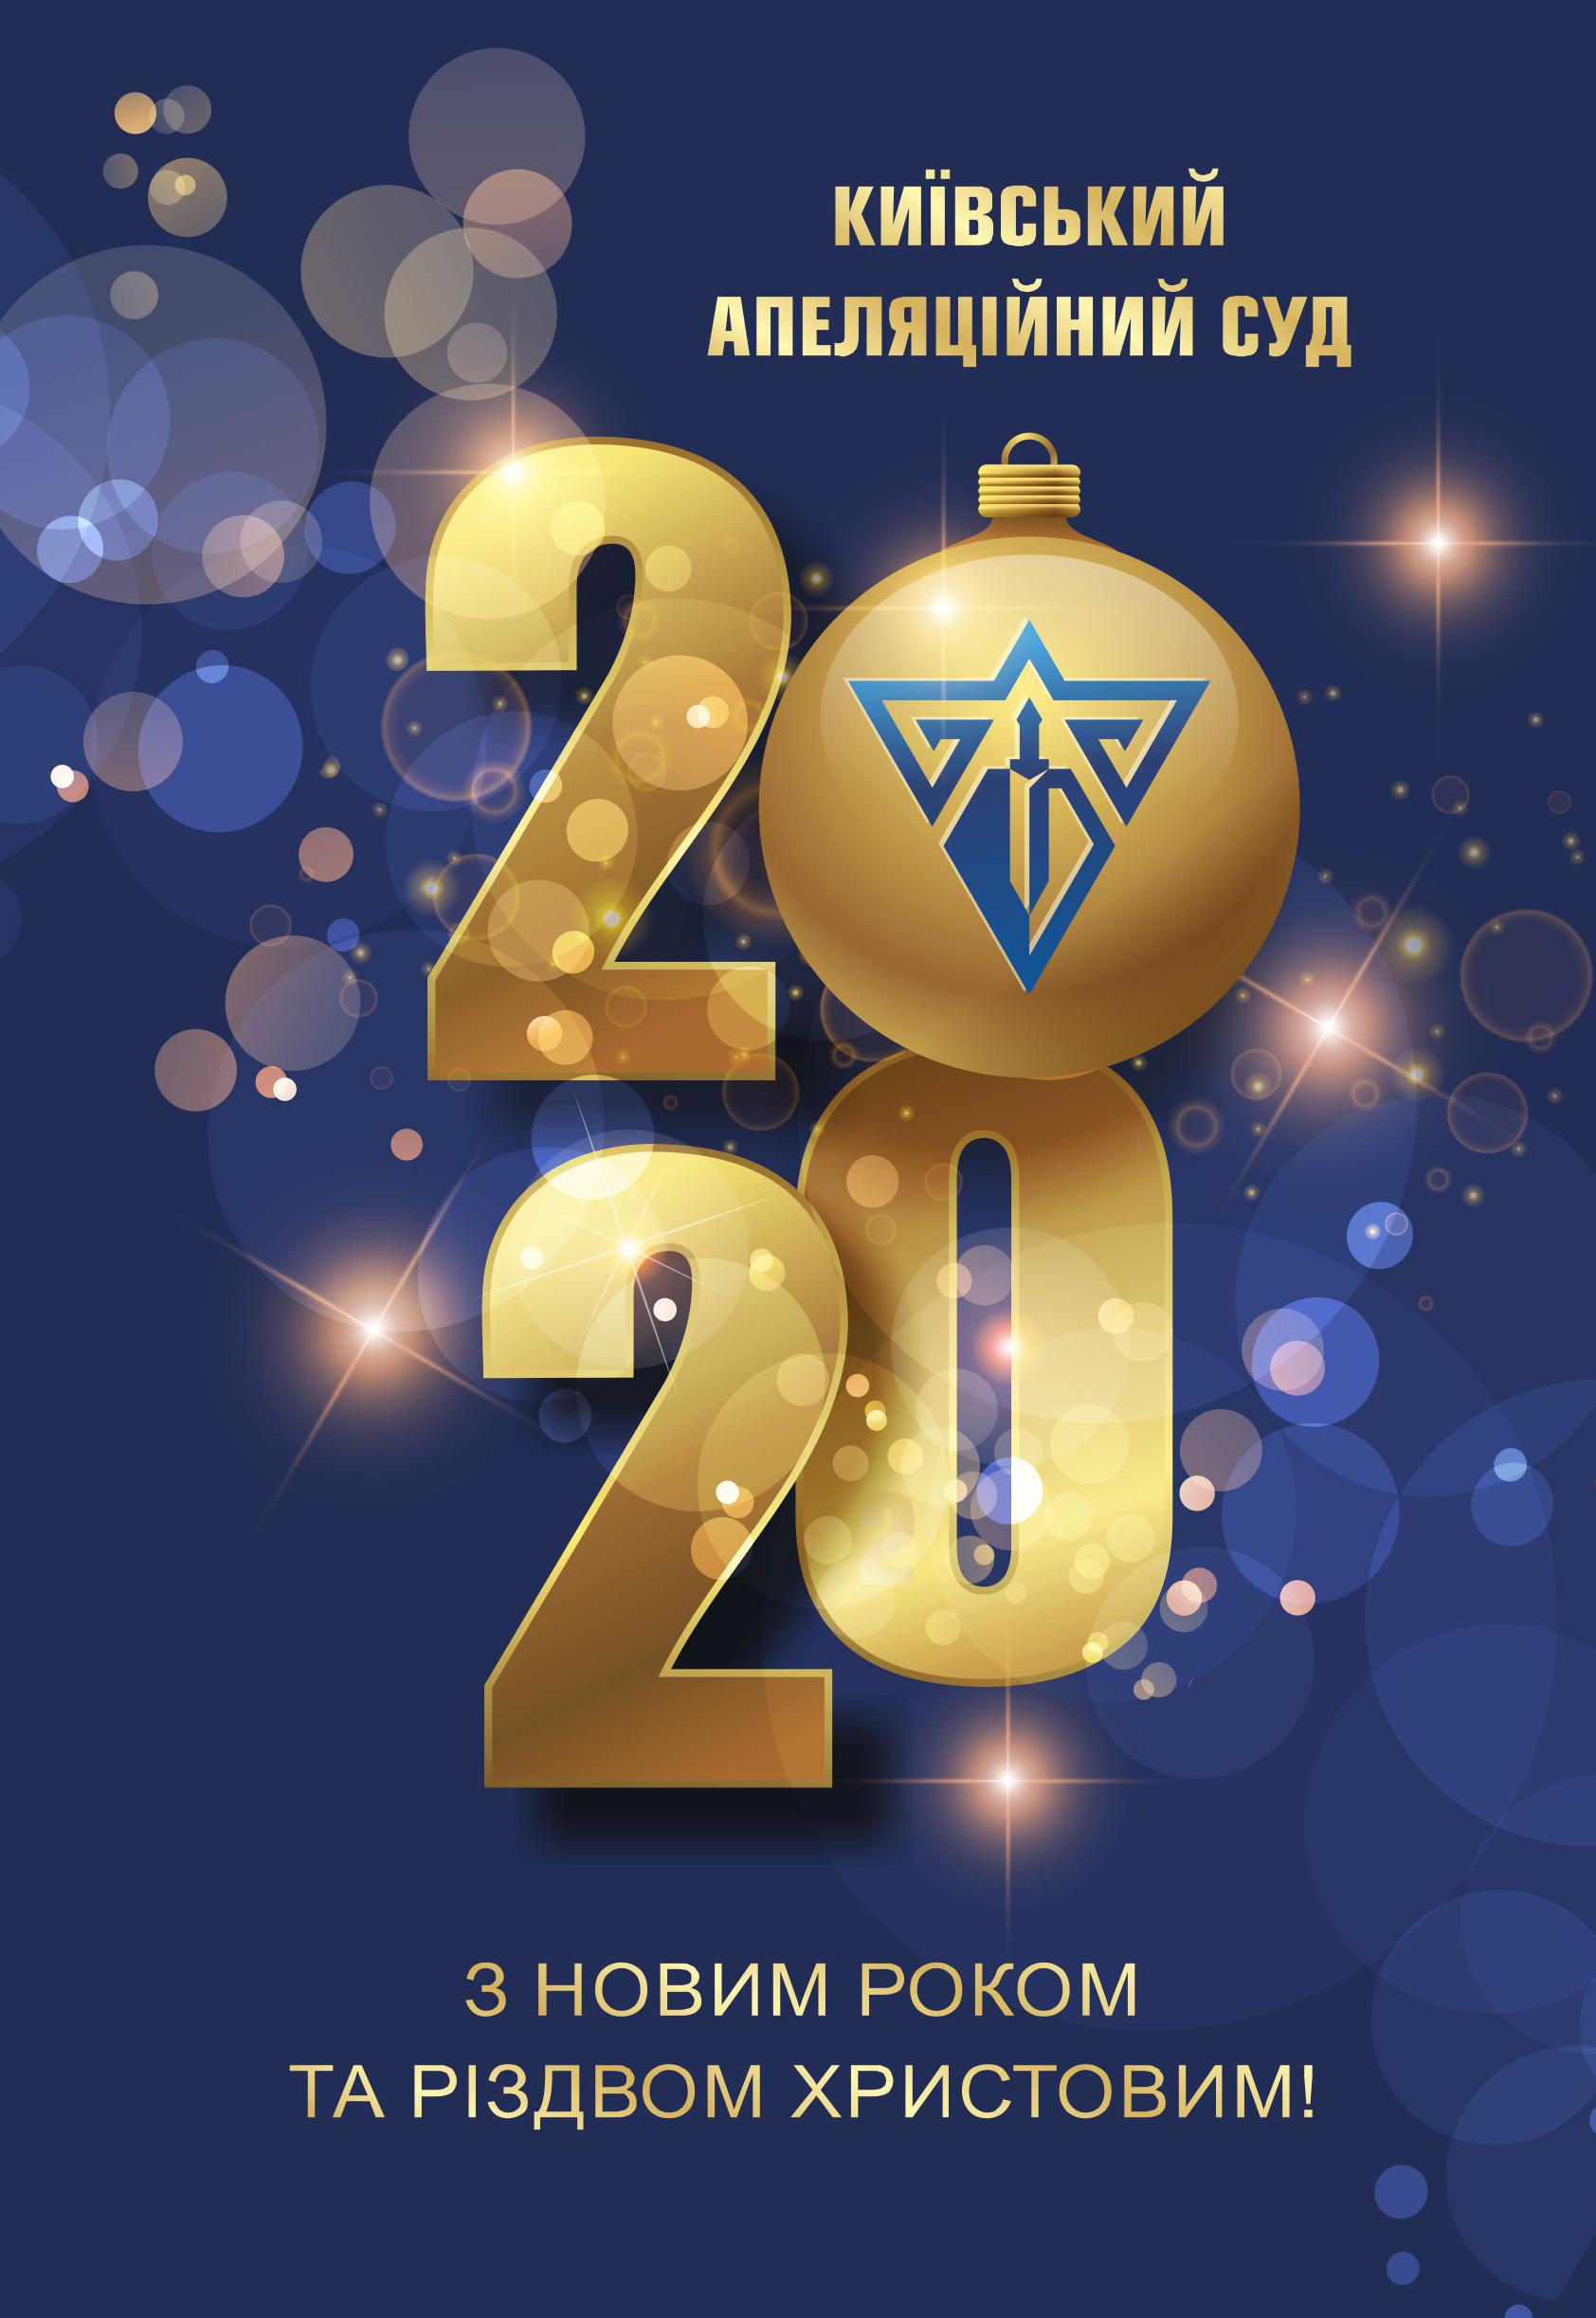 Kiev Appeal Court_Christmas Card 2020_3